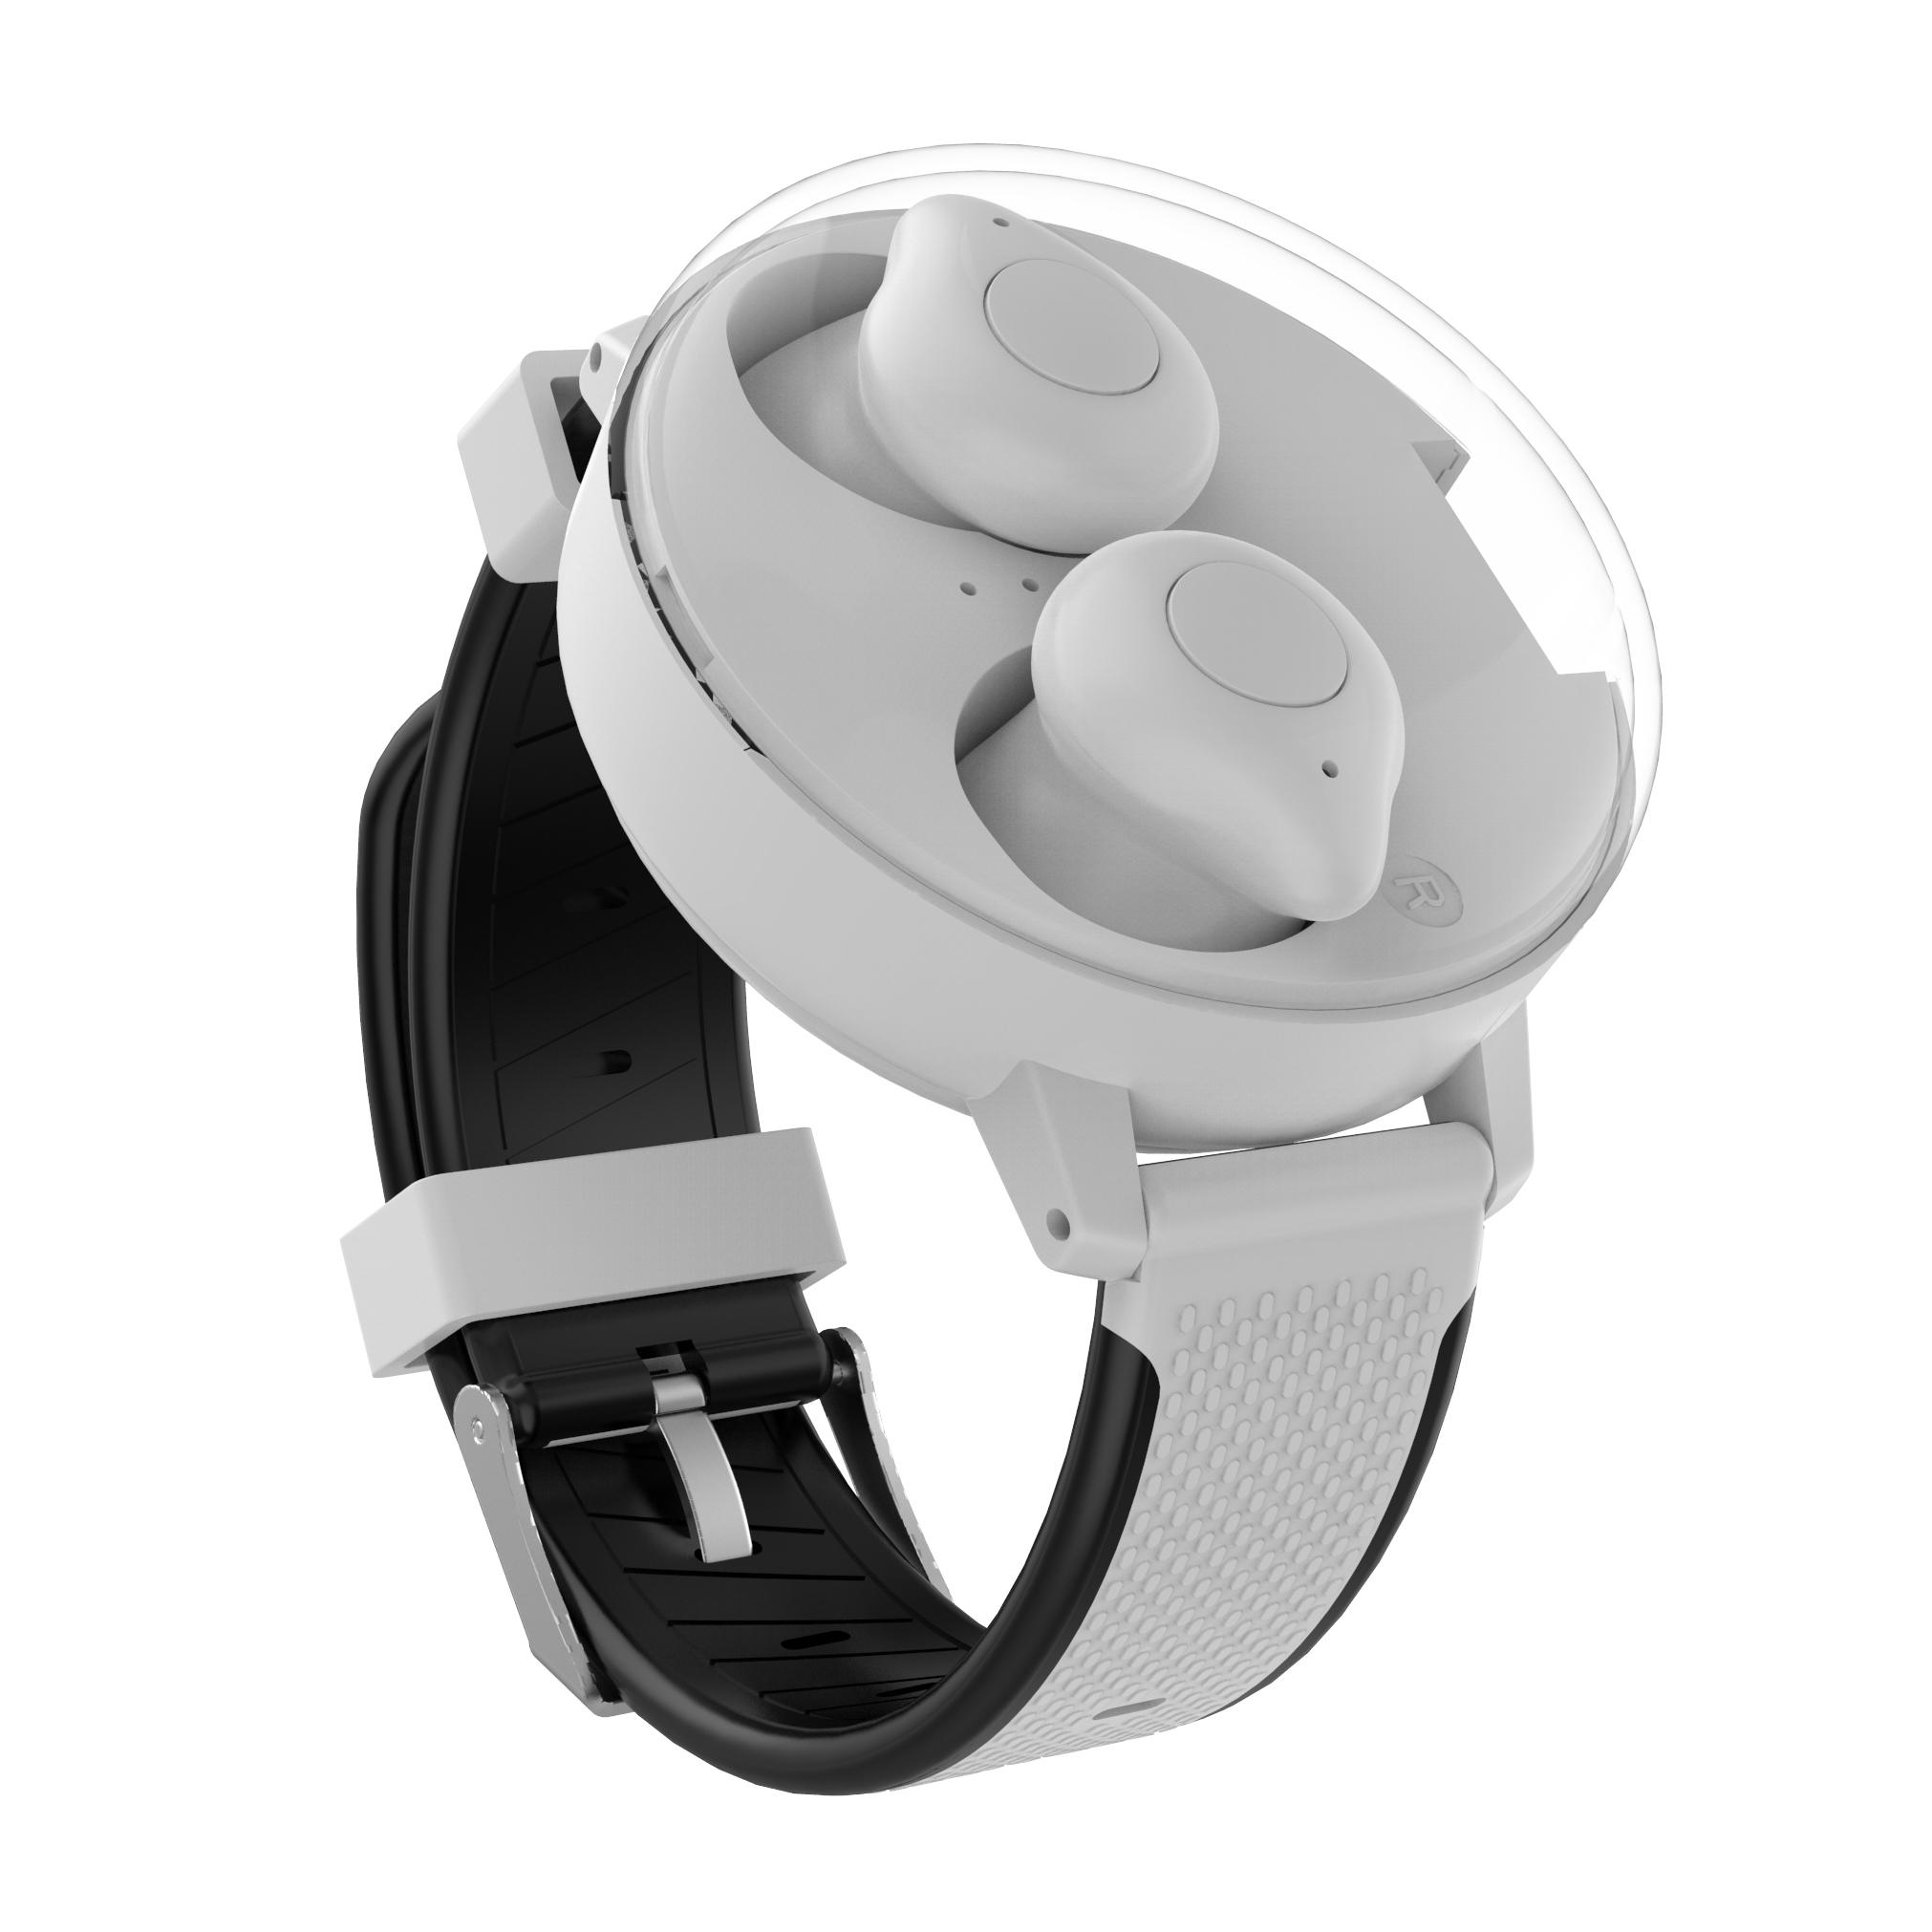 Bluetooth TWS Stereo Wireless Headphones 5.0 Charging Headset for Running white